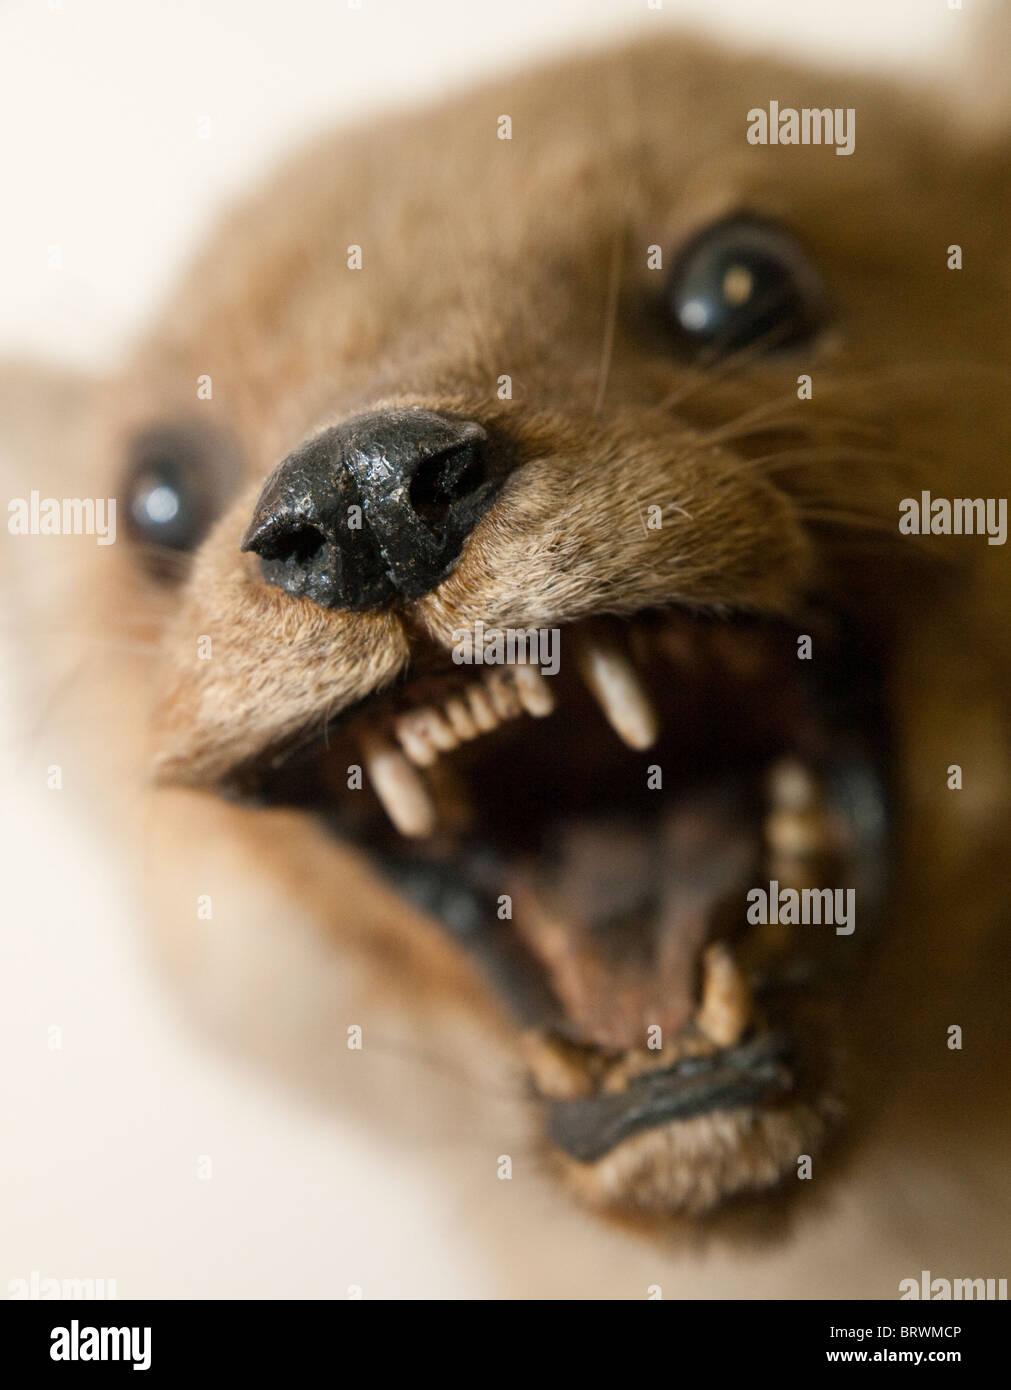 a stuffed animal taxidermy stock photo 31912294 alamy